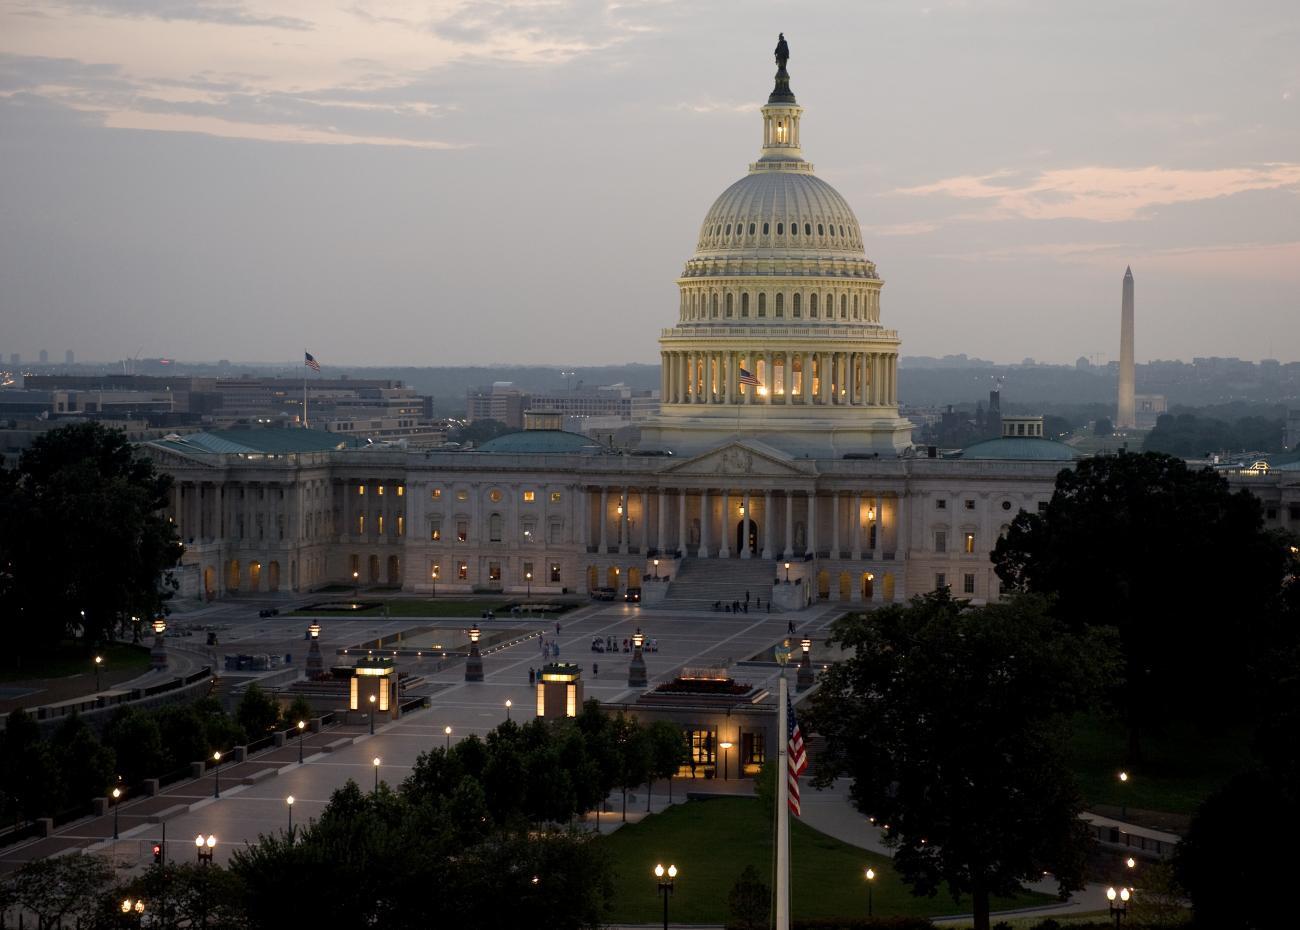 The U.S. Capital building. Photo courtesy U.S. Capital Visitor Center.